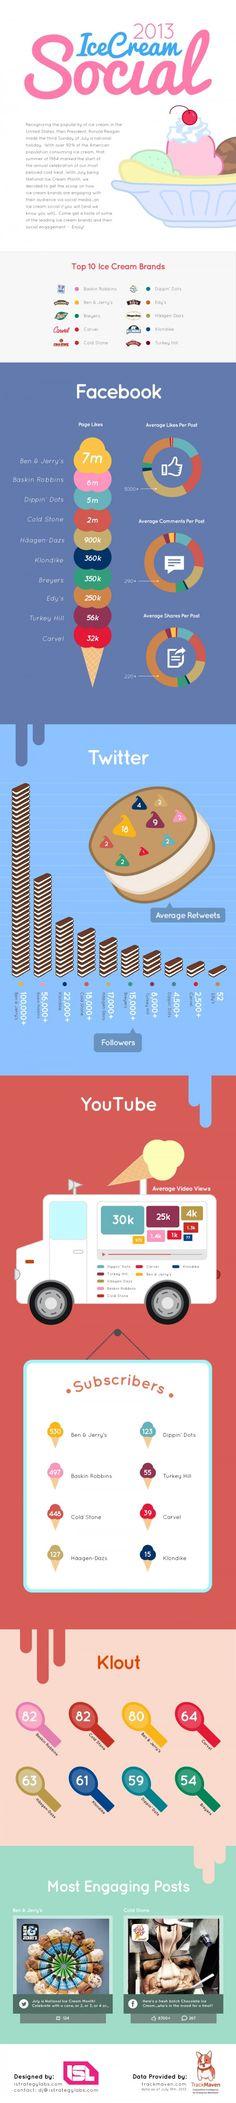 Top Ice Cream Brands On Social Media [INFOGRAPHIC]